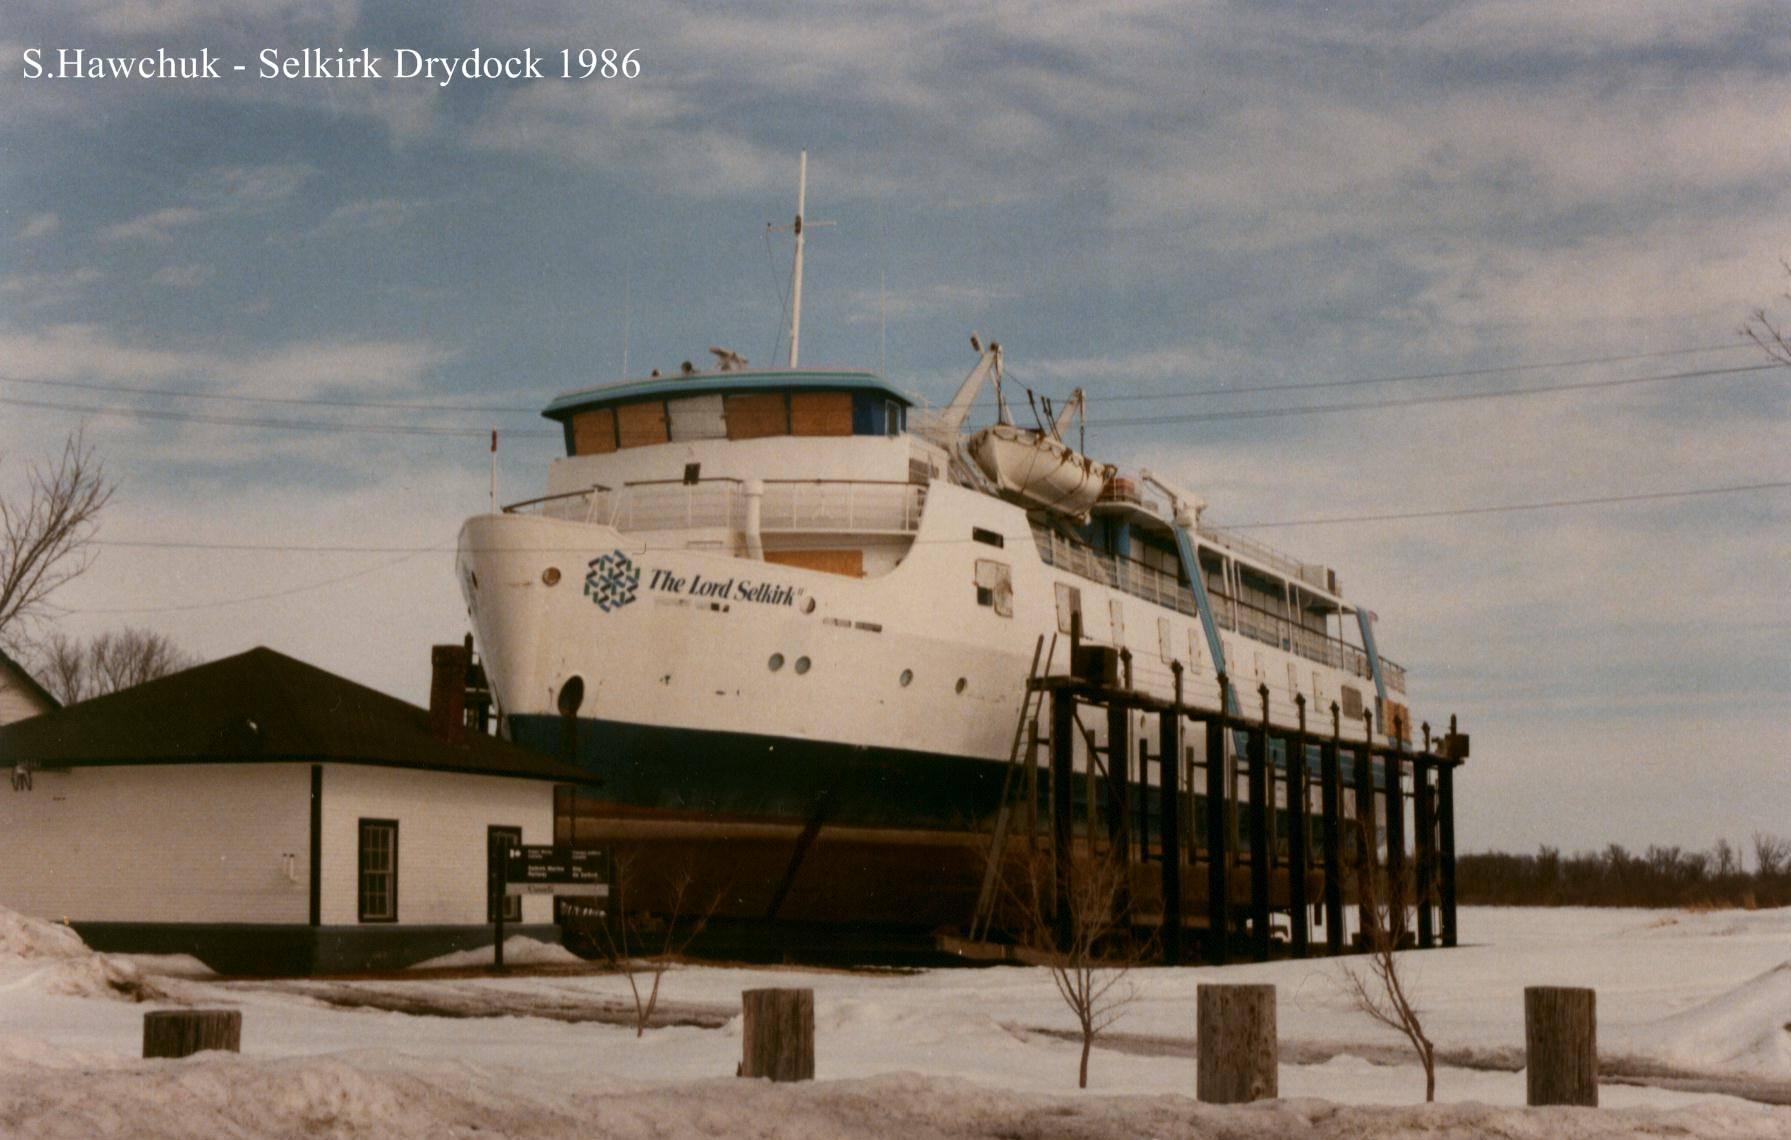 tn_1200_sh_lord_selkirk_1986_drydock_last_time.jpg